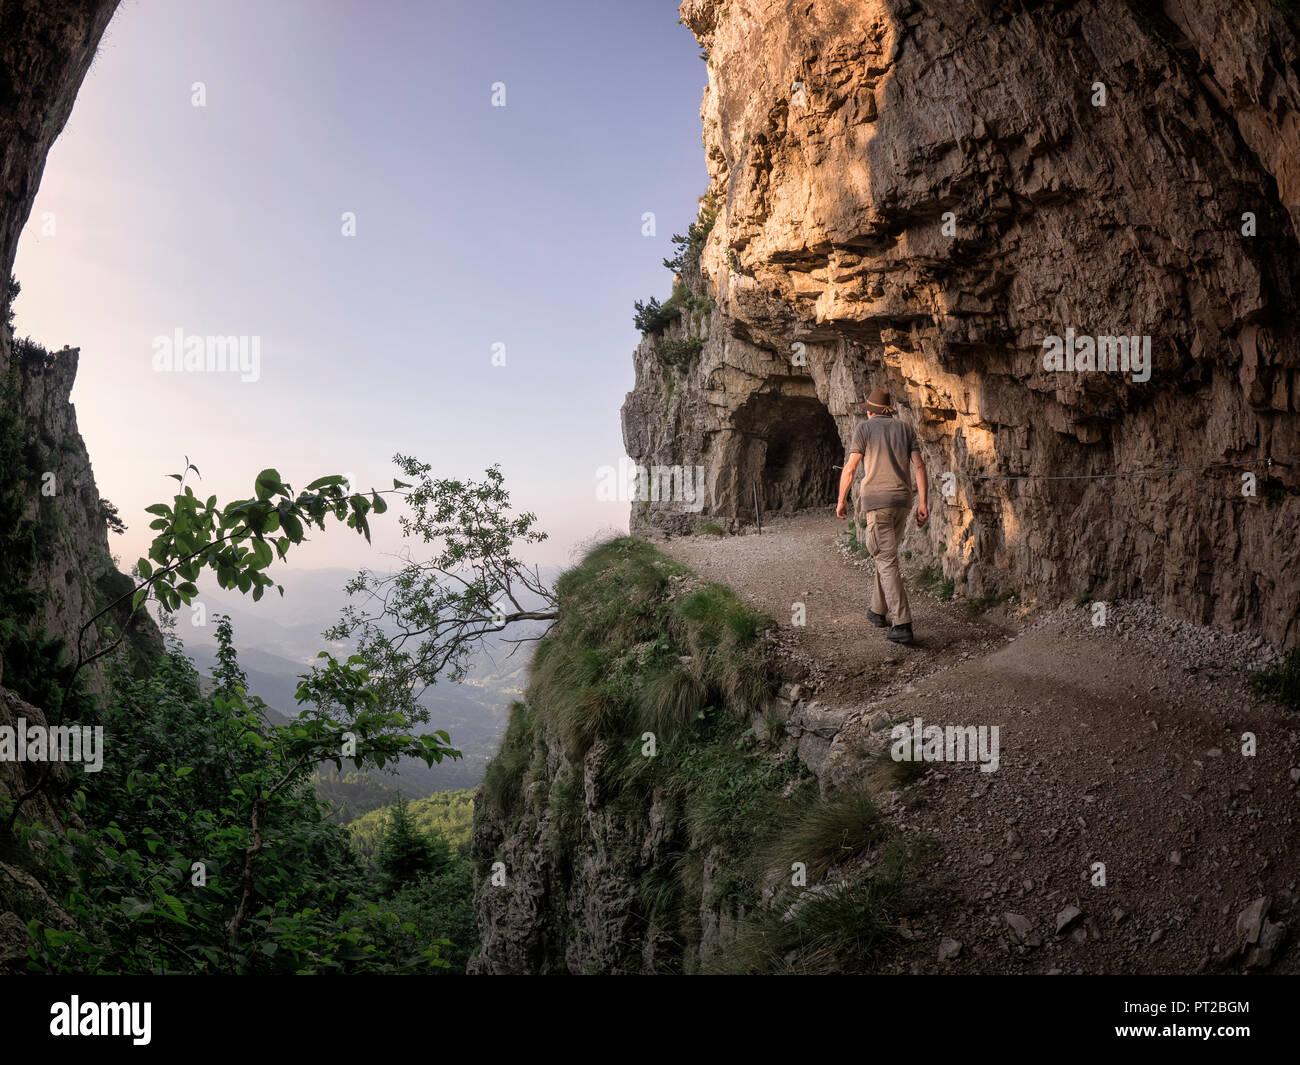 Italy, Veneto, Strada delle 52 Gallerie, hiker on the move - Stock Image